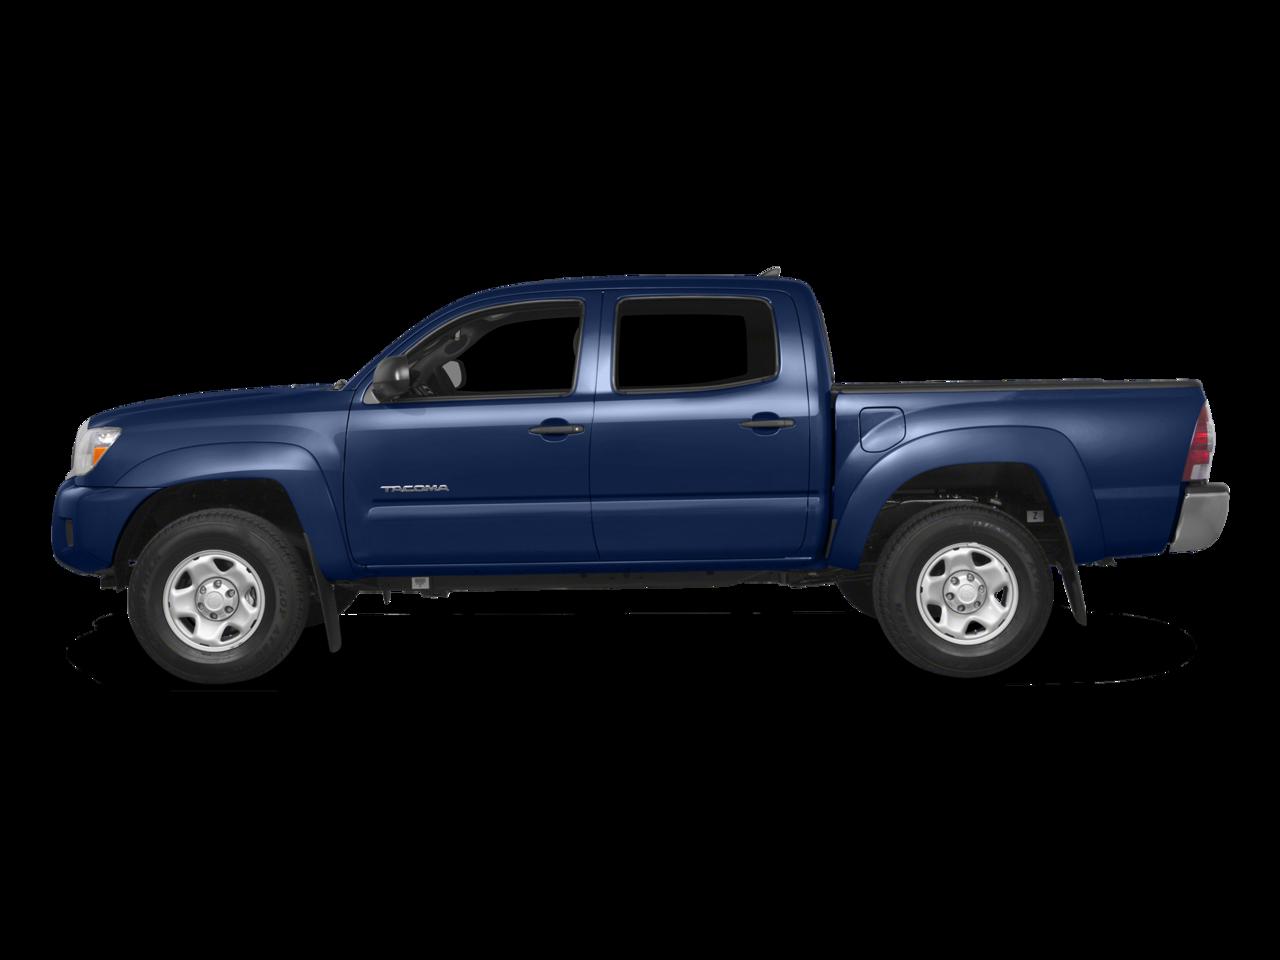 2015 Toyota Tacoma Short Bed